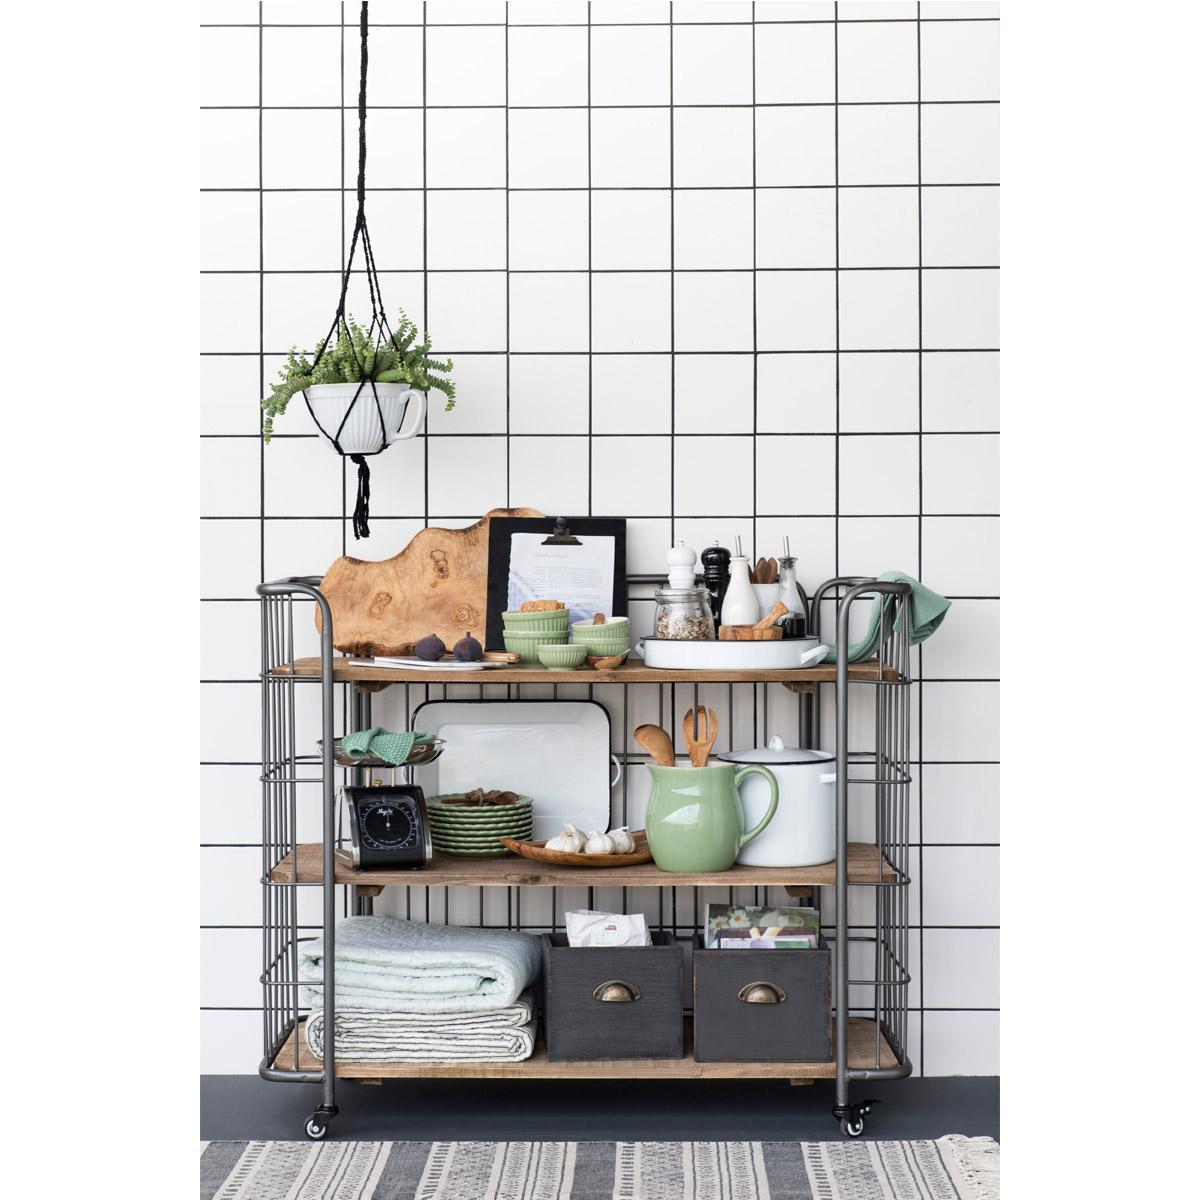 glasglocke bilder ideen couchstyle. Black Bedroom Furniture Sets. Home Design Ideas